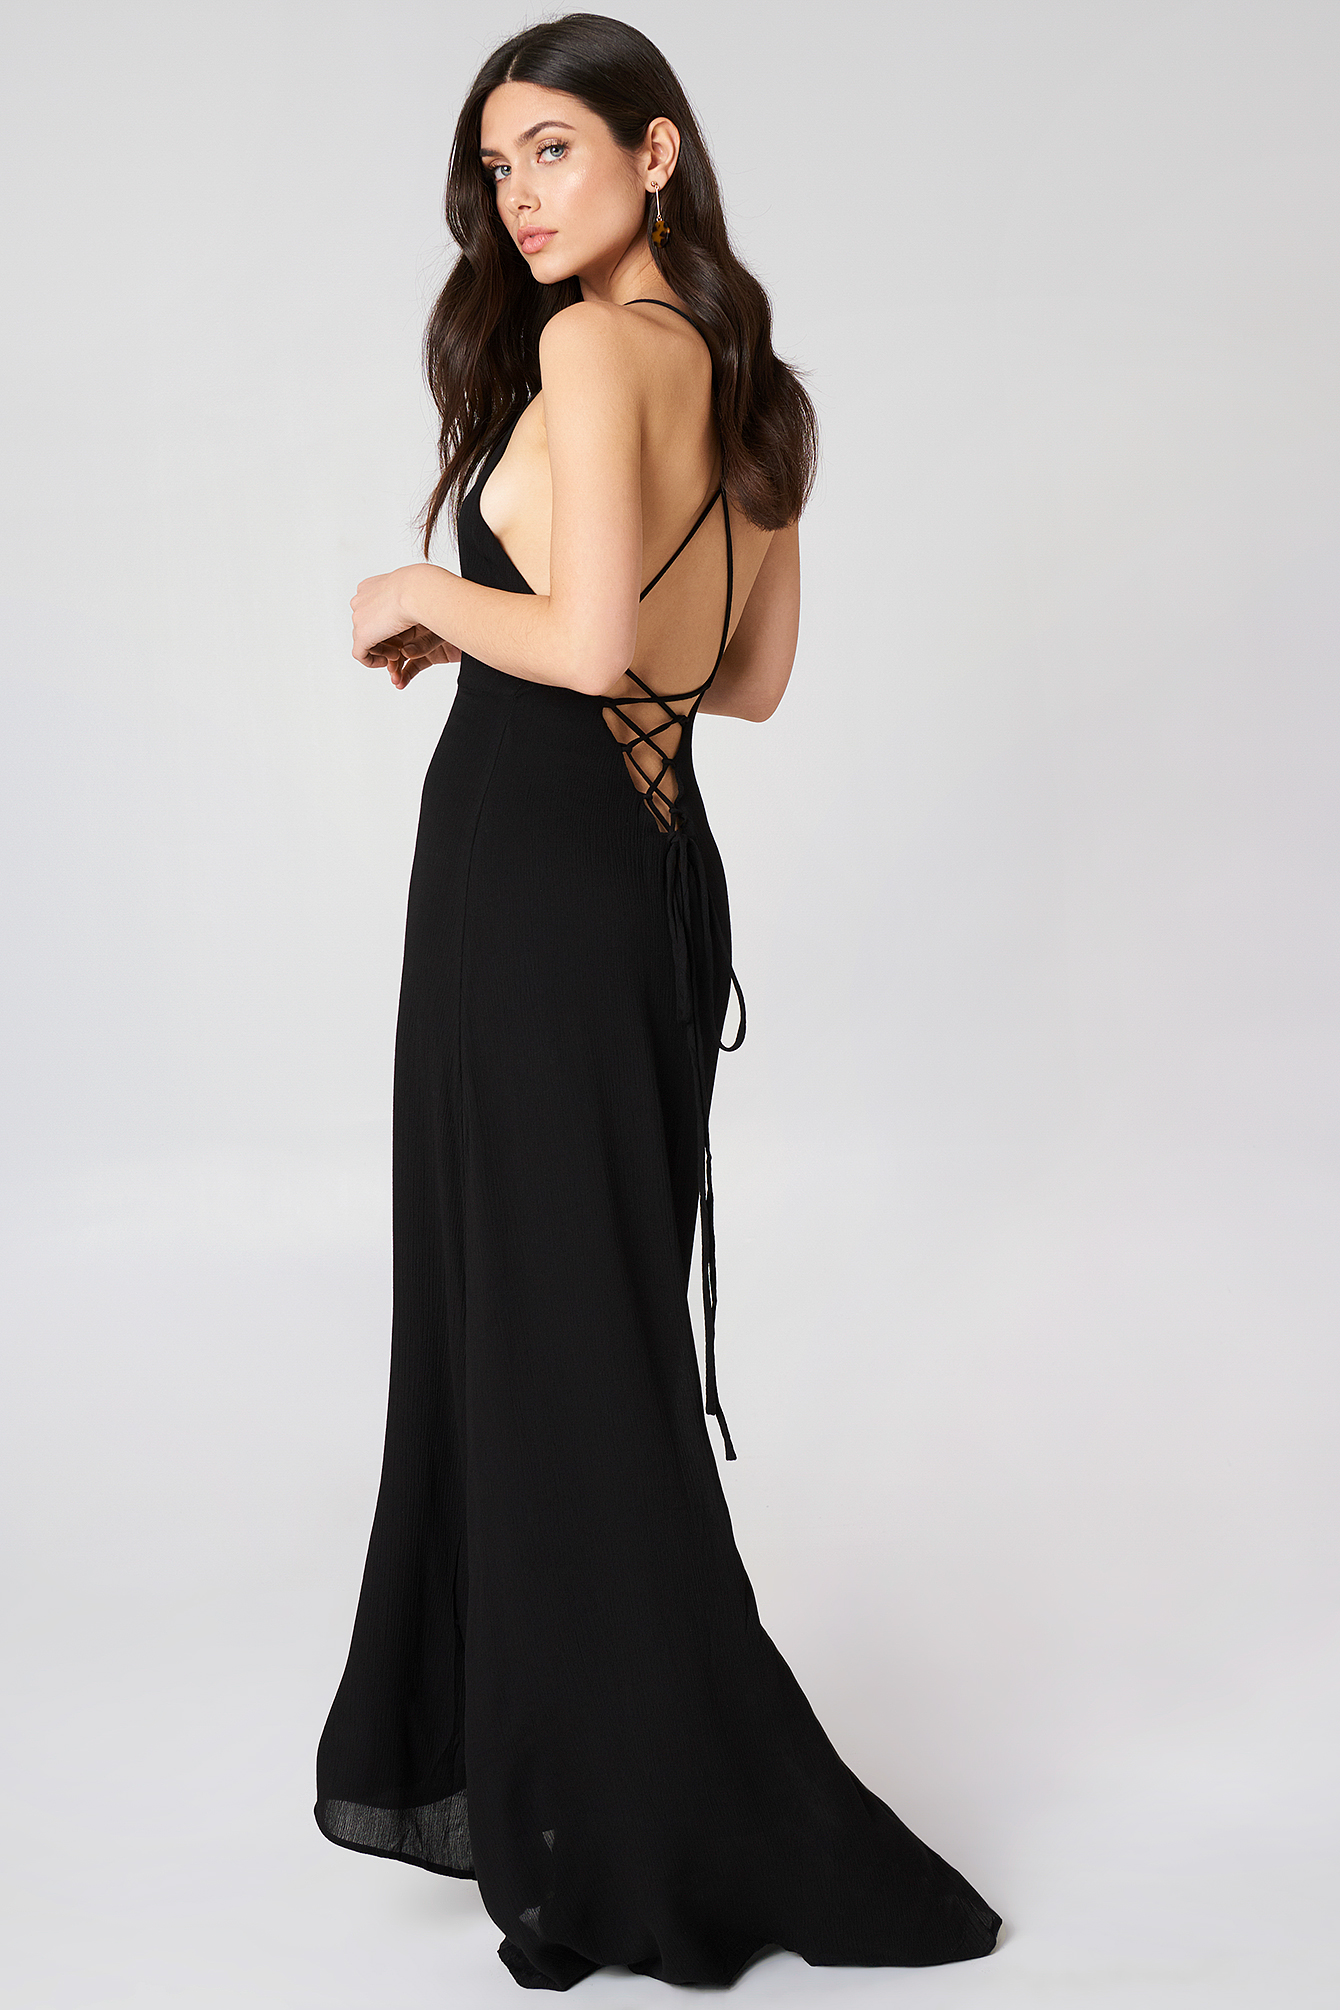 GIRL & THE SUN LUNA TIE BACK MAXI DRESS - BLACK